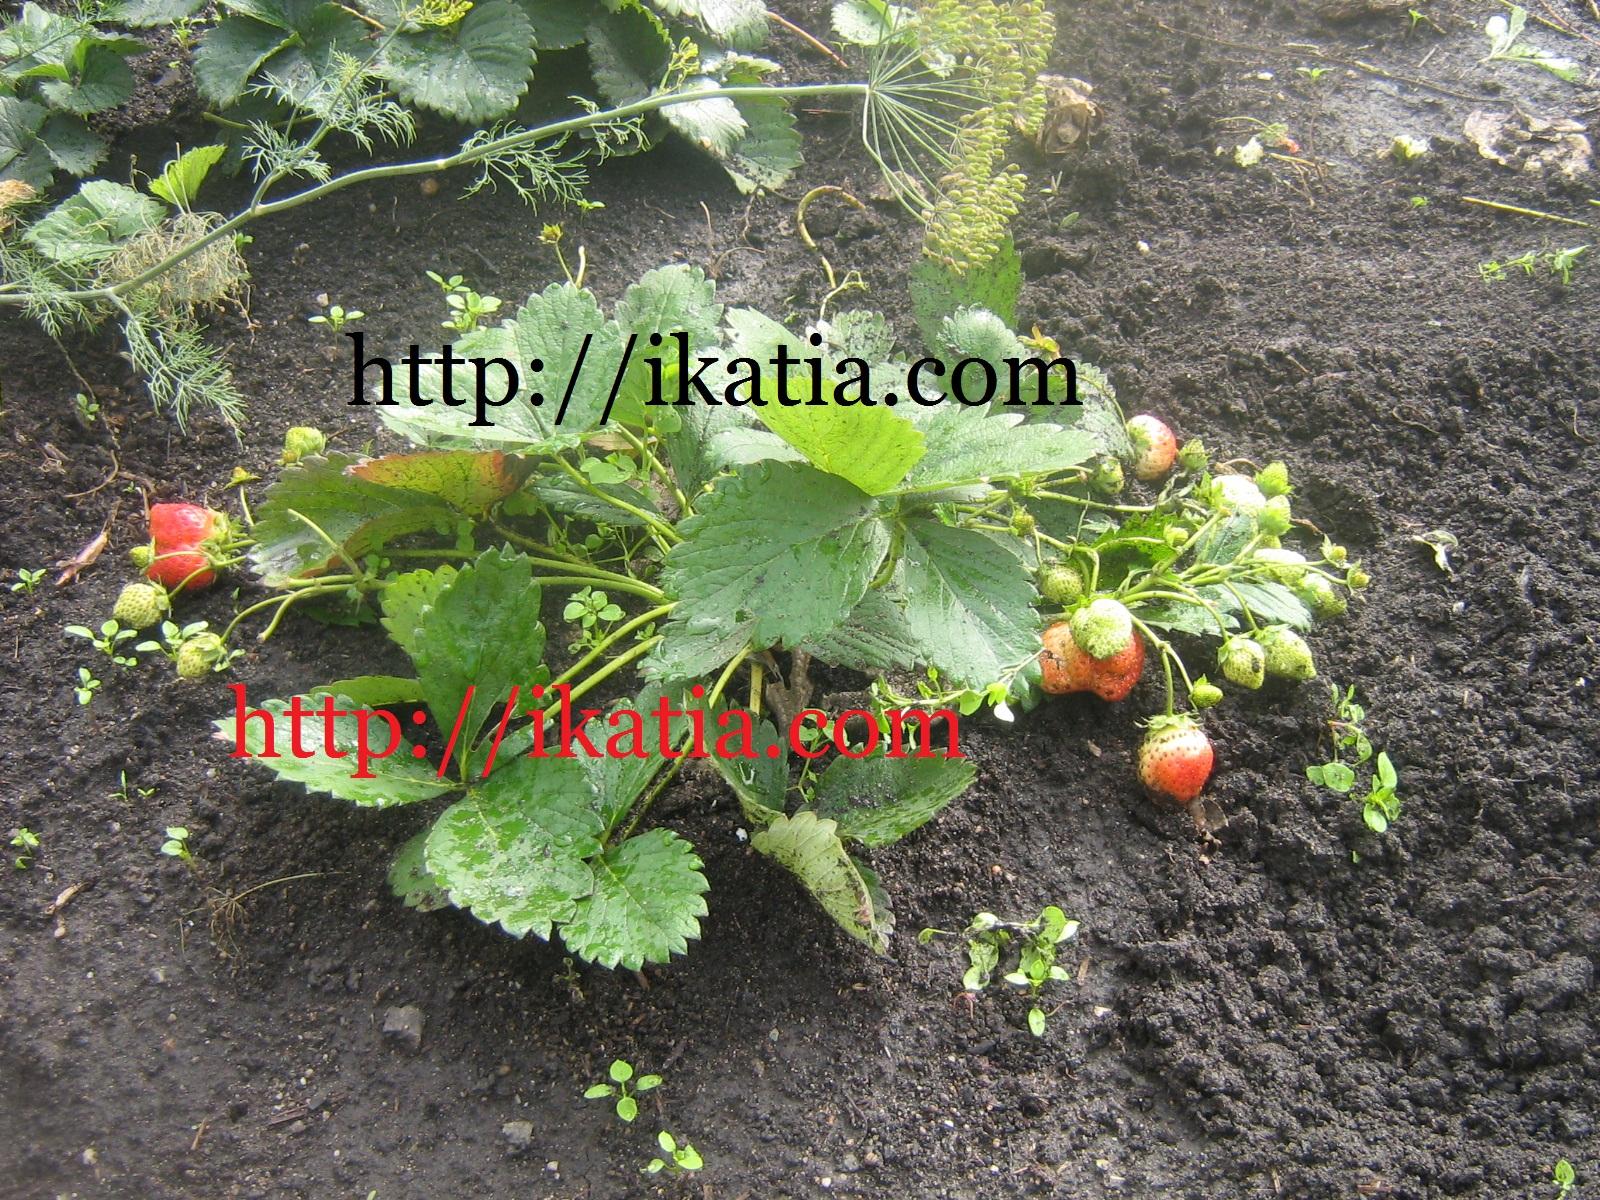 Выращивание клубники: сорта, какие ...: ikatia.com/cad/vyirashhivanie-klubniki-sorta-kakie-rabotyi-provodit...